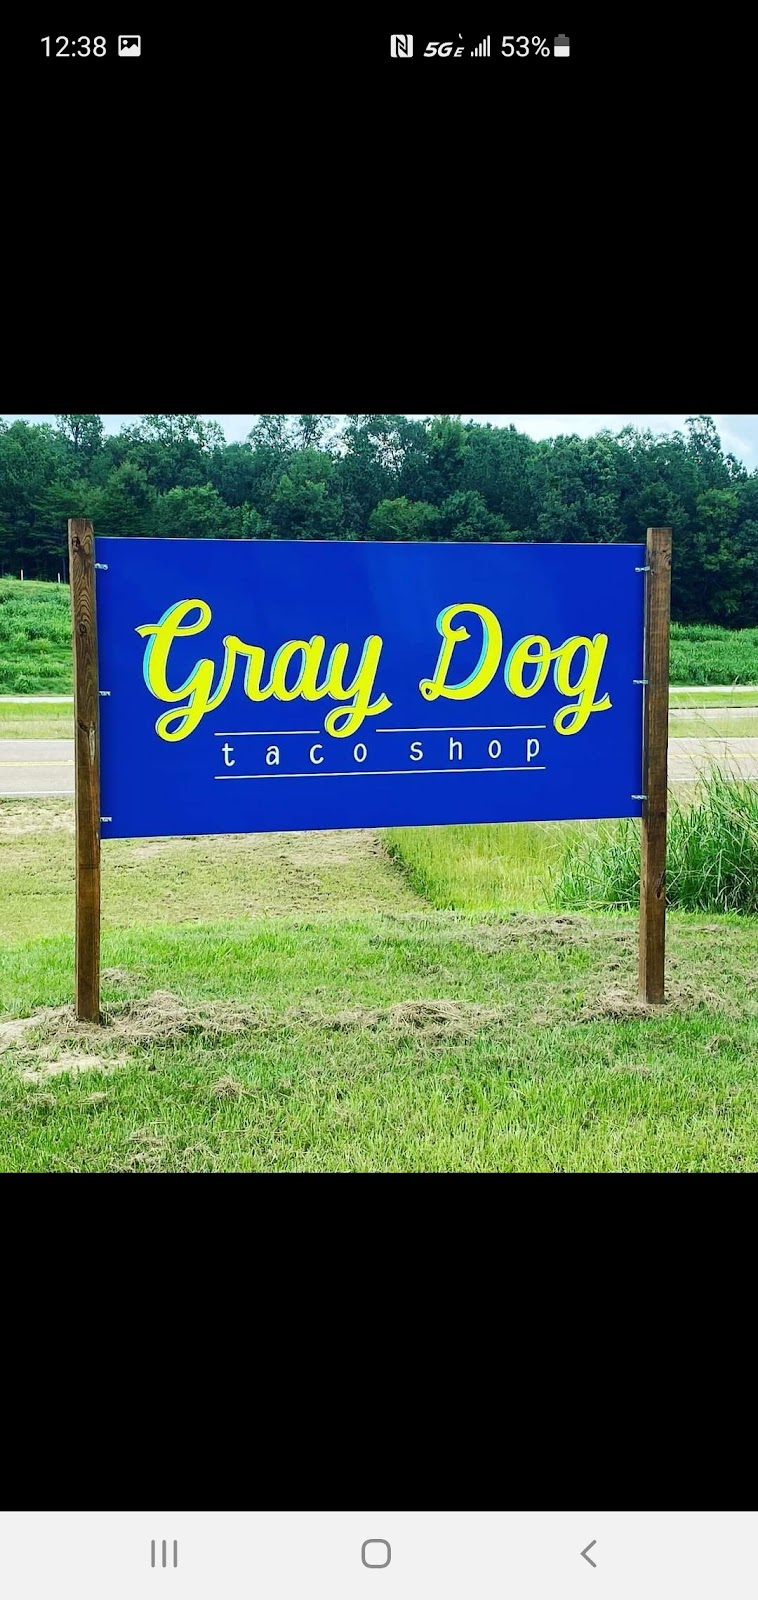 The Gray Dog Taco Shop | restaurant | 1052 Magnolia Way, Blue Springs, MS 38828, USA | 6628323447 OR +1 662-832-3447